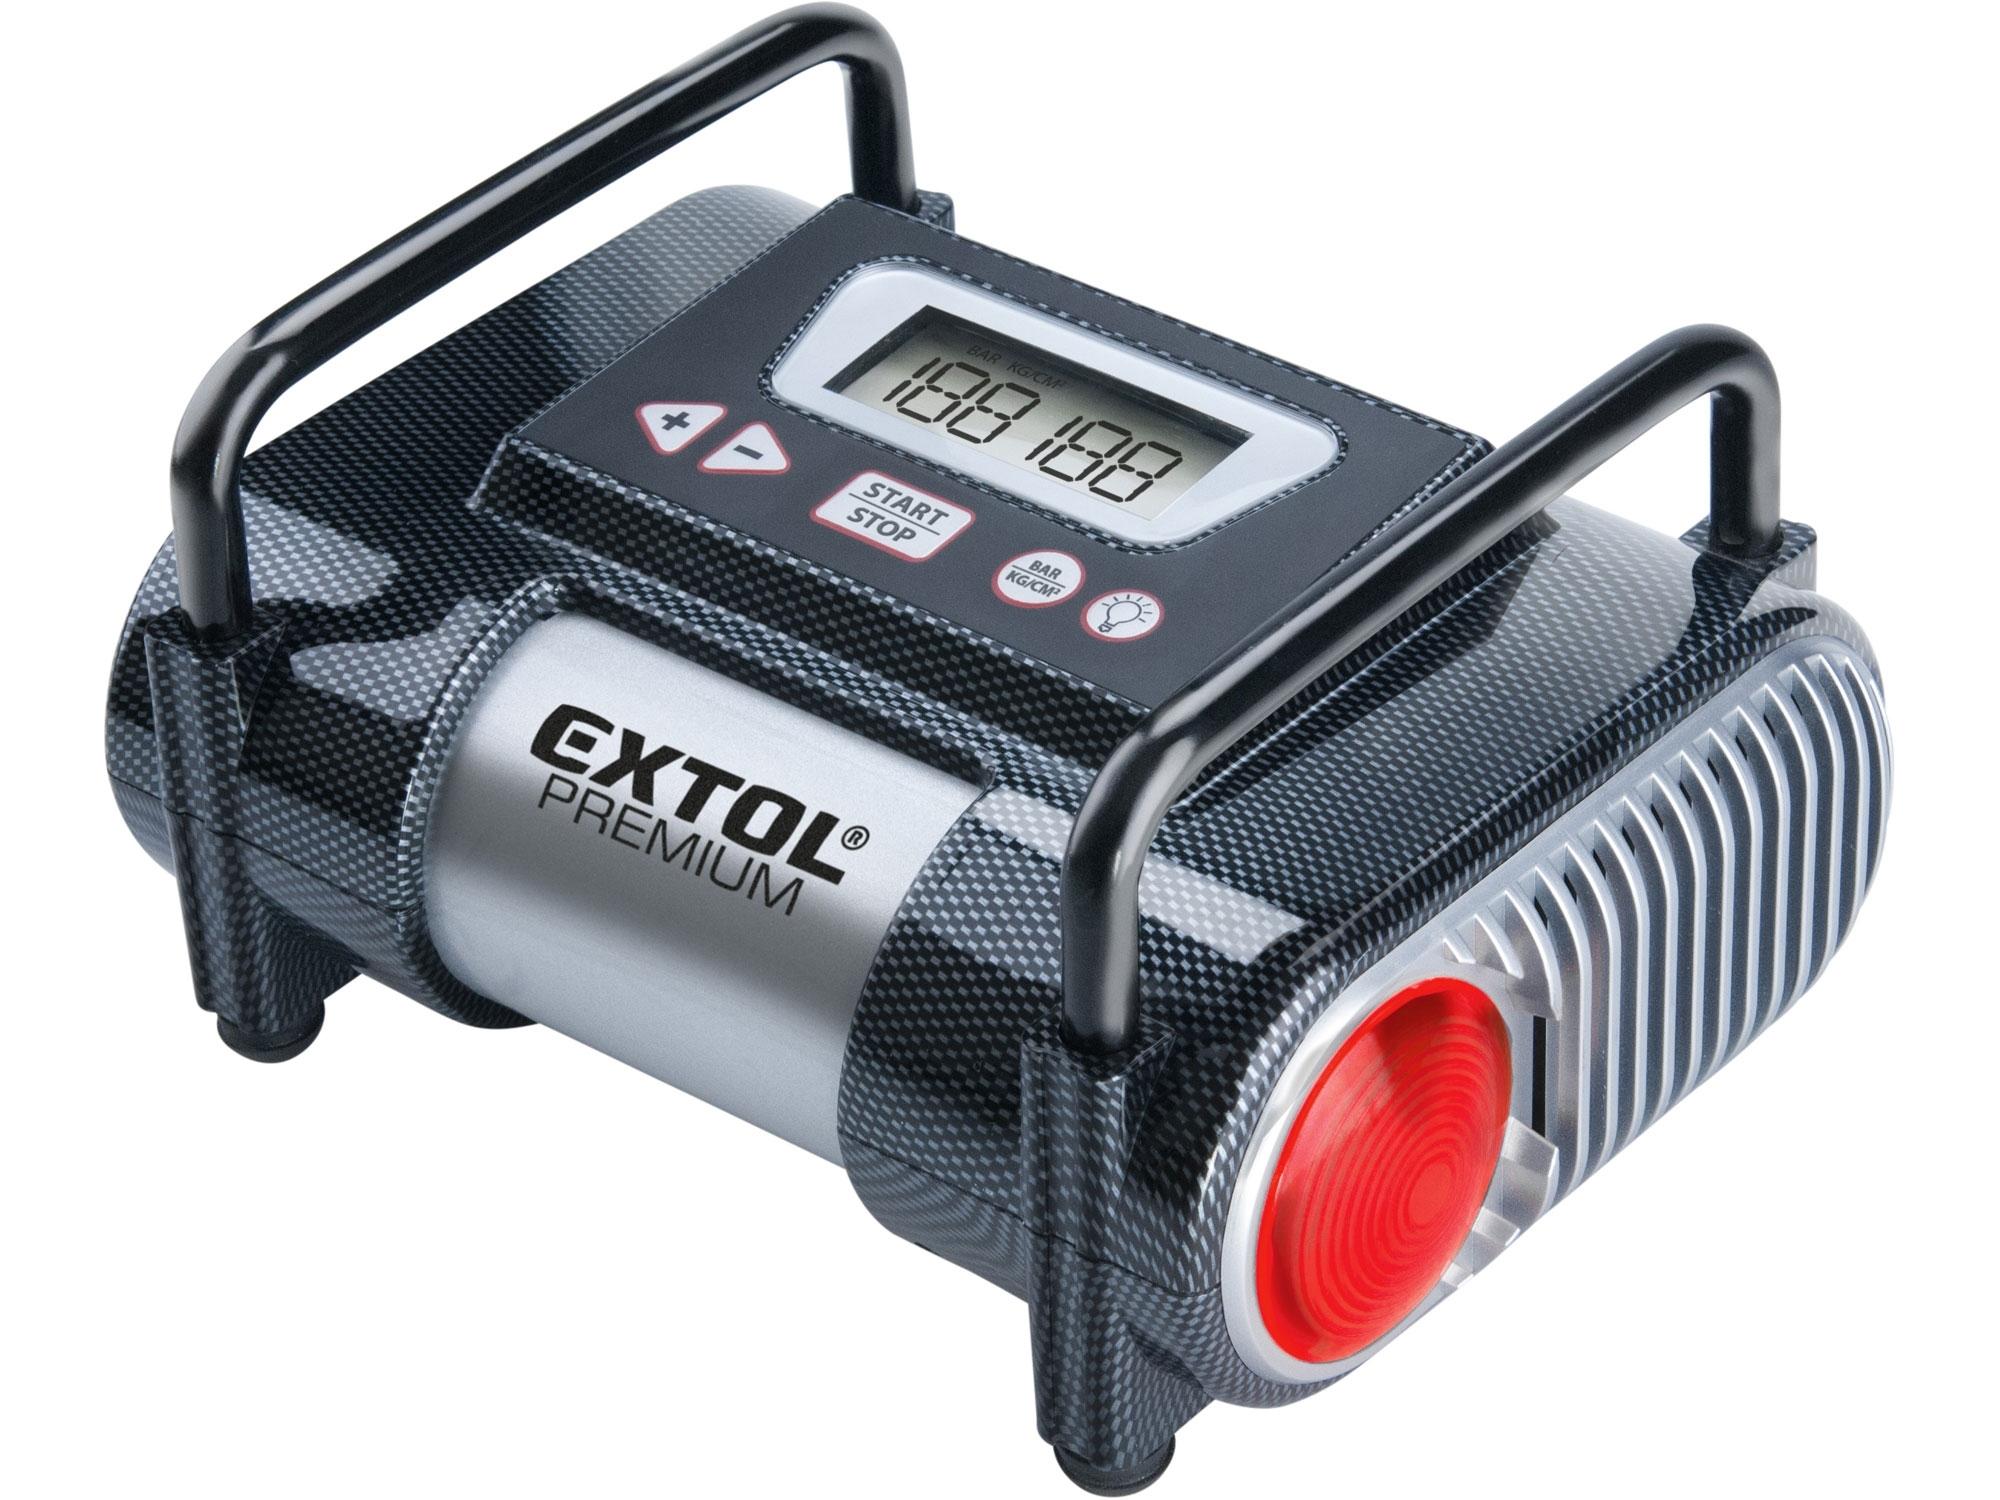 kompresor auto 12V, automatický s LCD a světlem, 12V, 6,9bar, EXTOL PREMIUM, CC 140 8864006